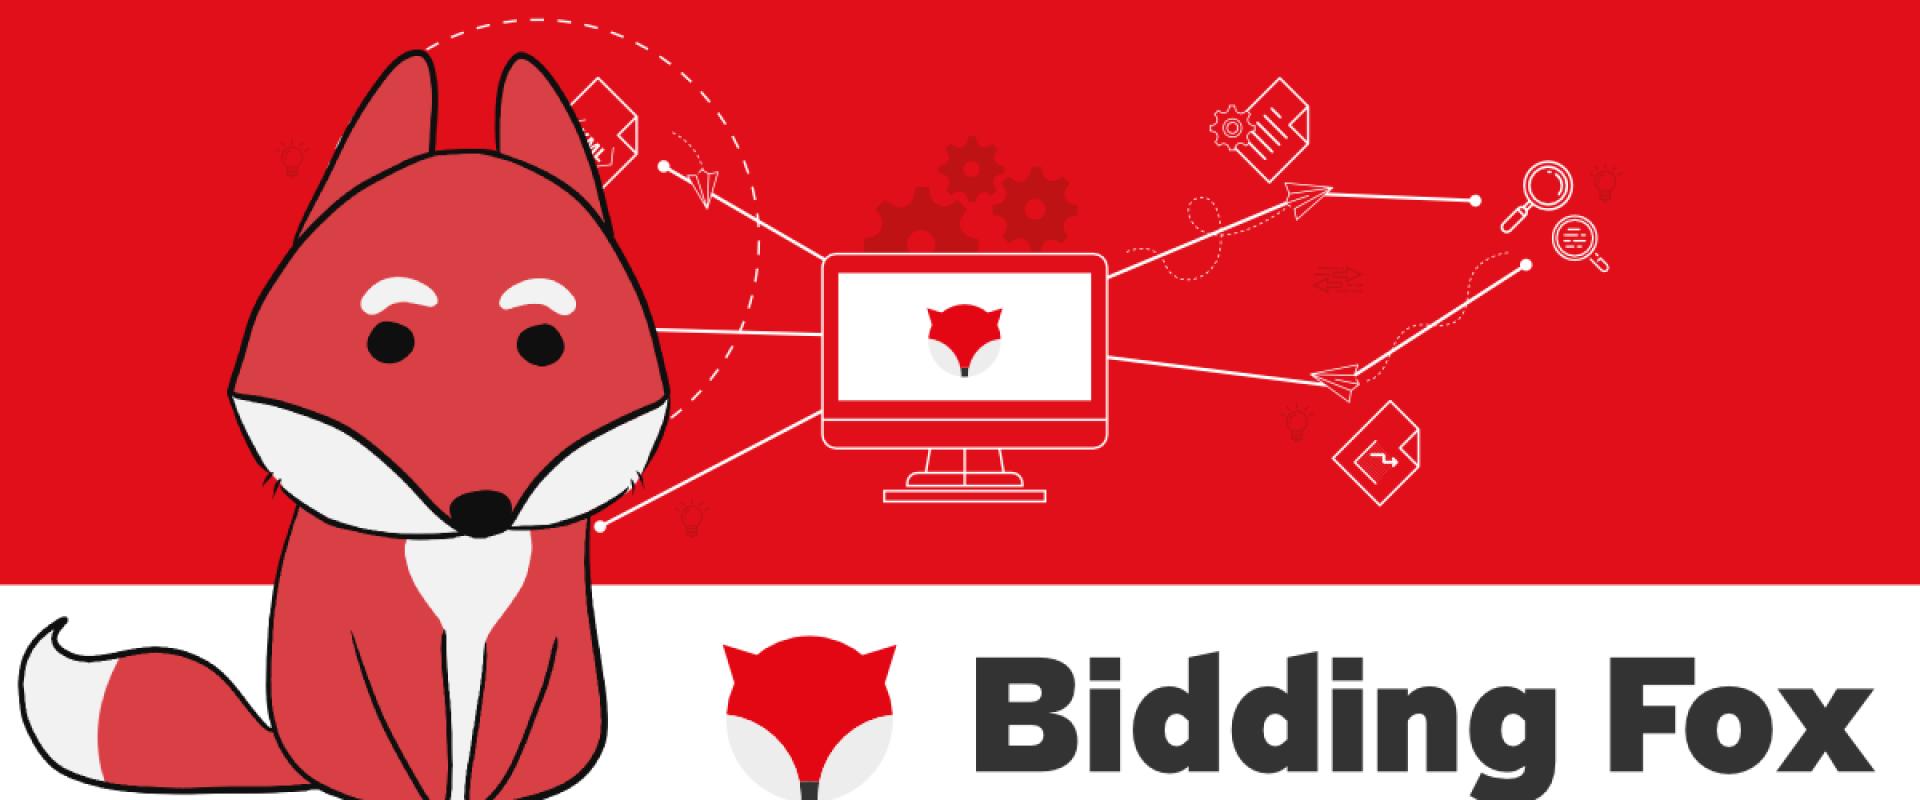 biddingfox-wallpaper